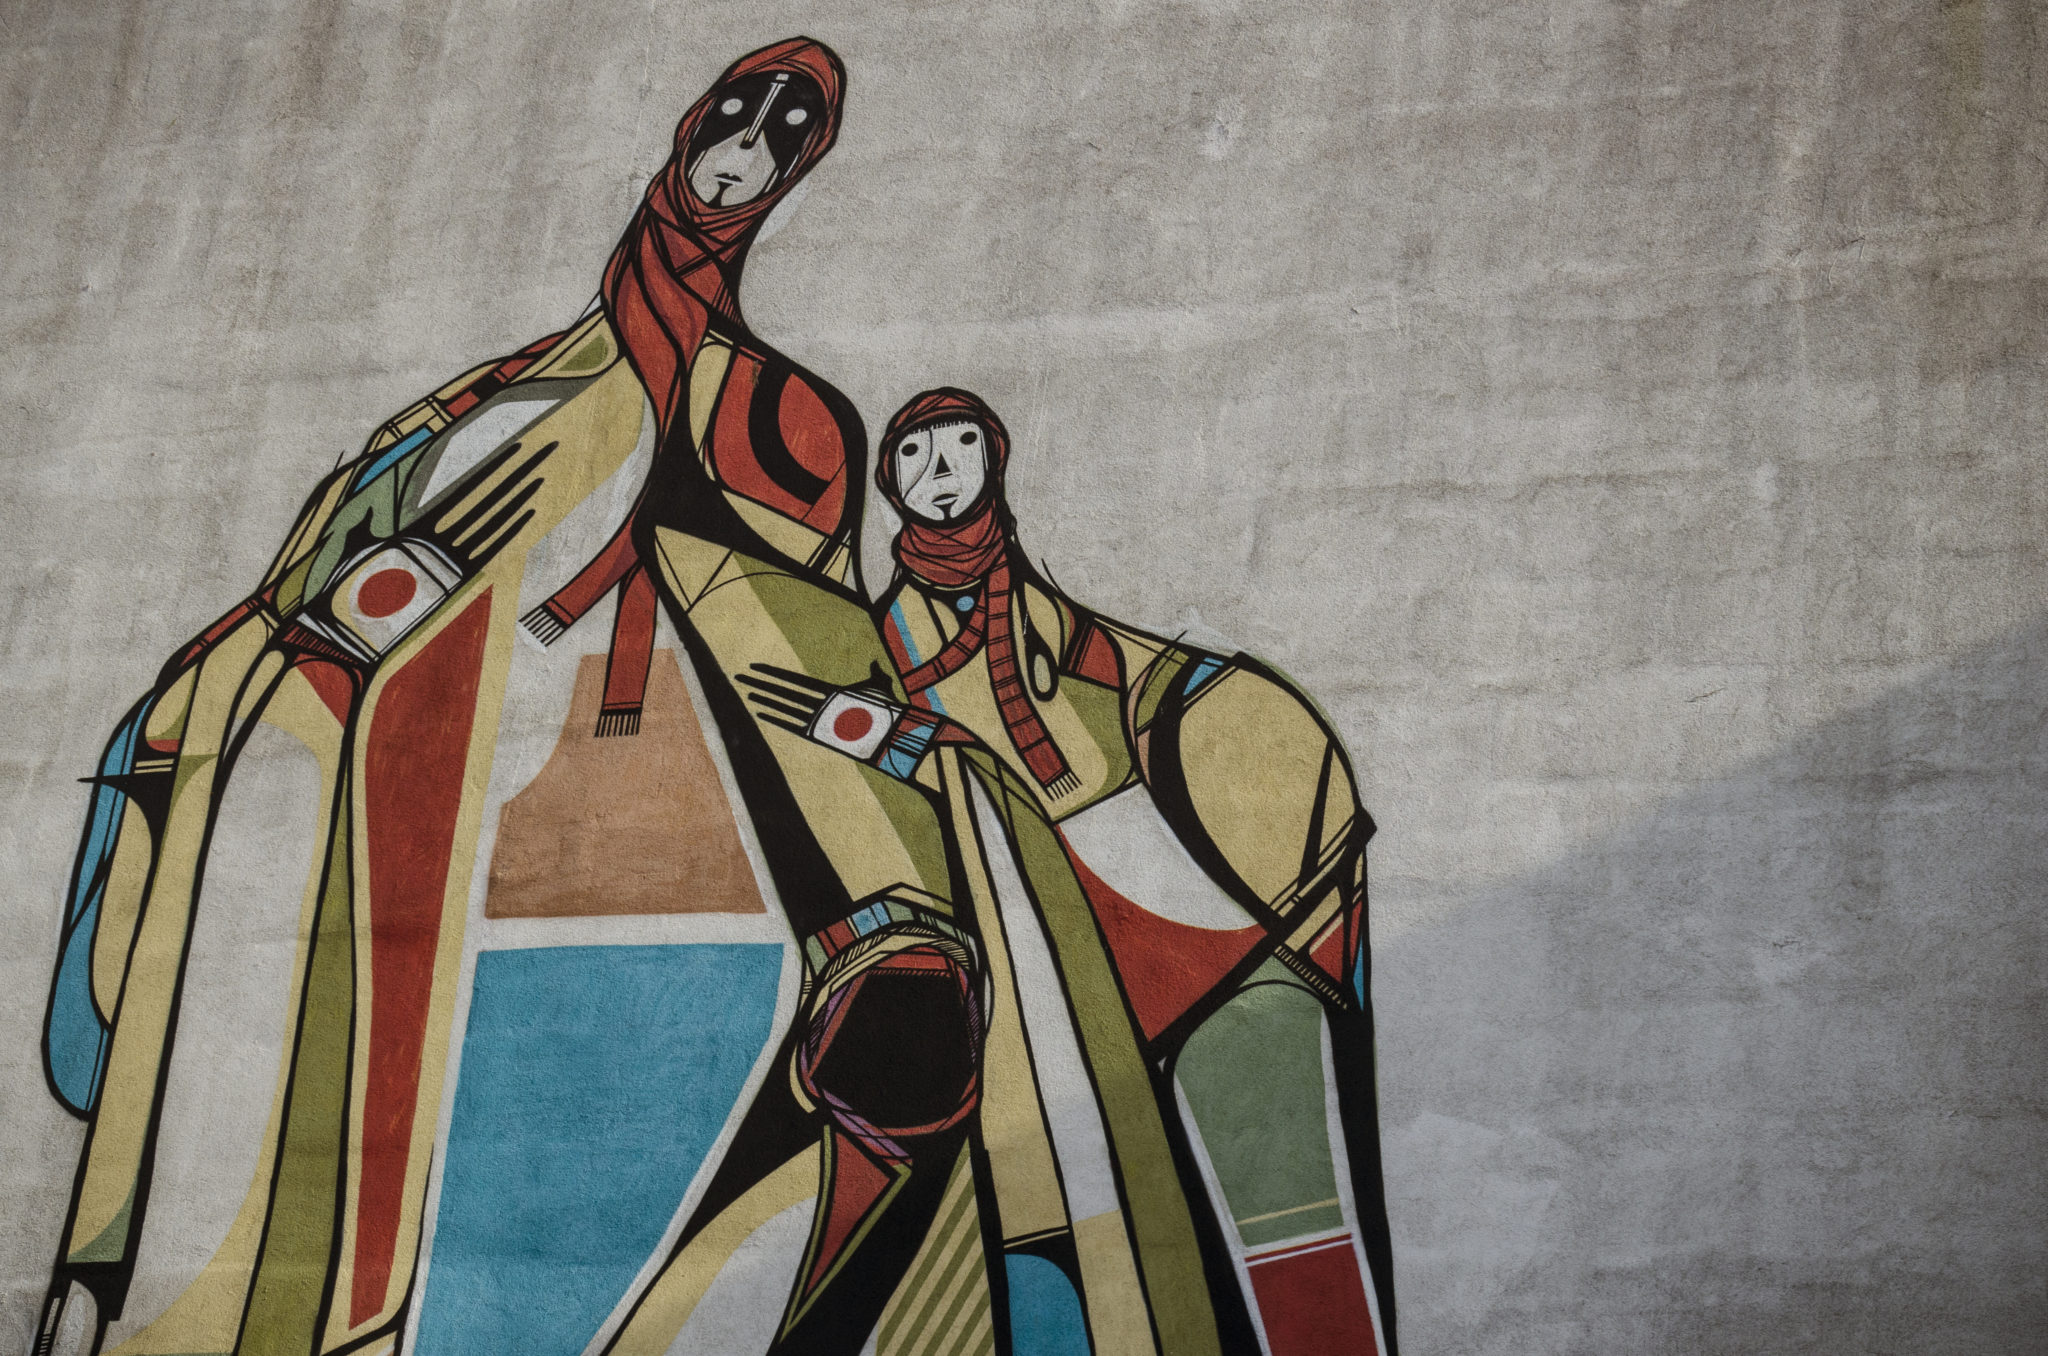 Tuerkei-Sehenswuerdigkeiten-Kopftuch-Graffiti-Streetart